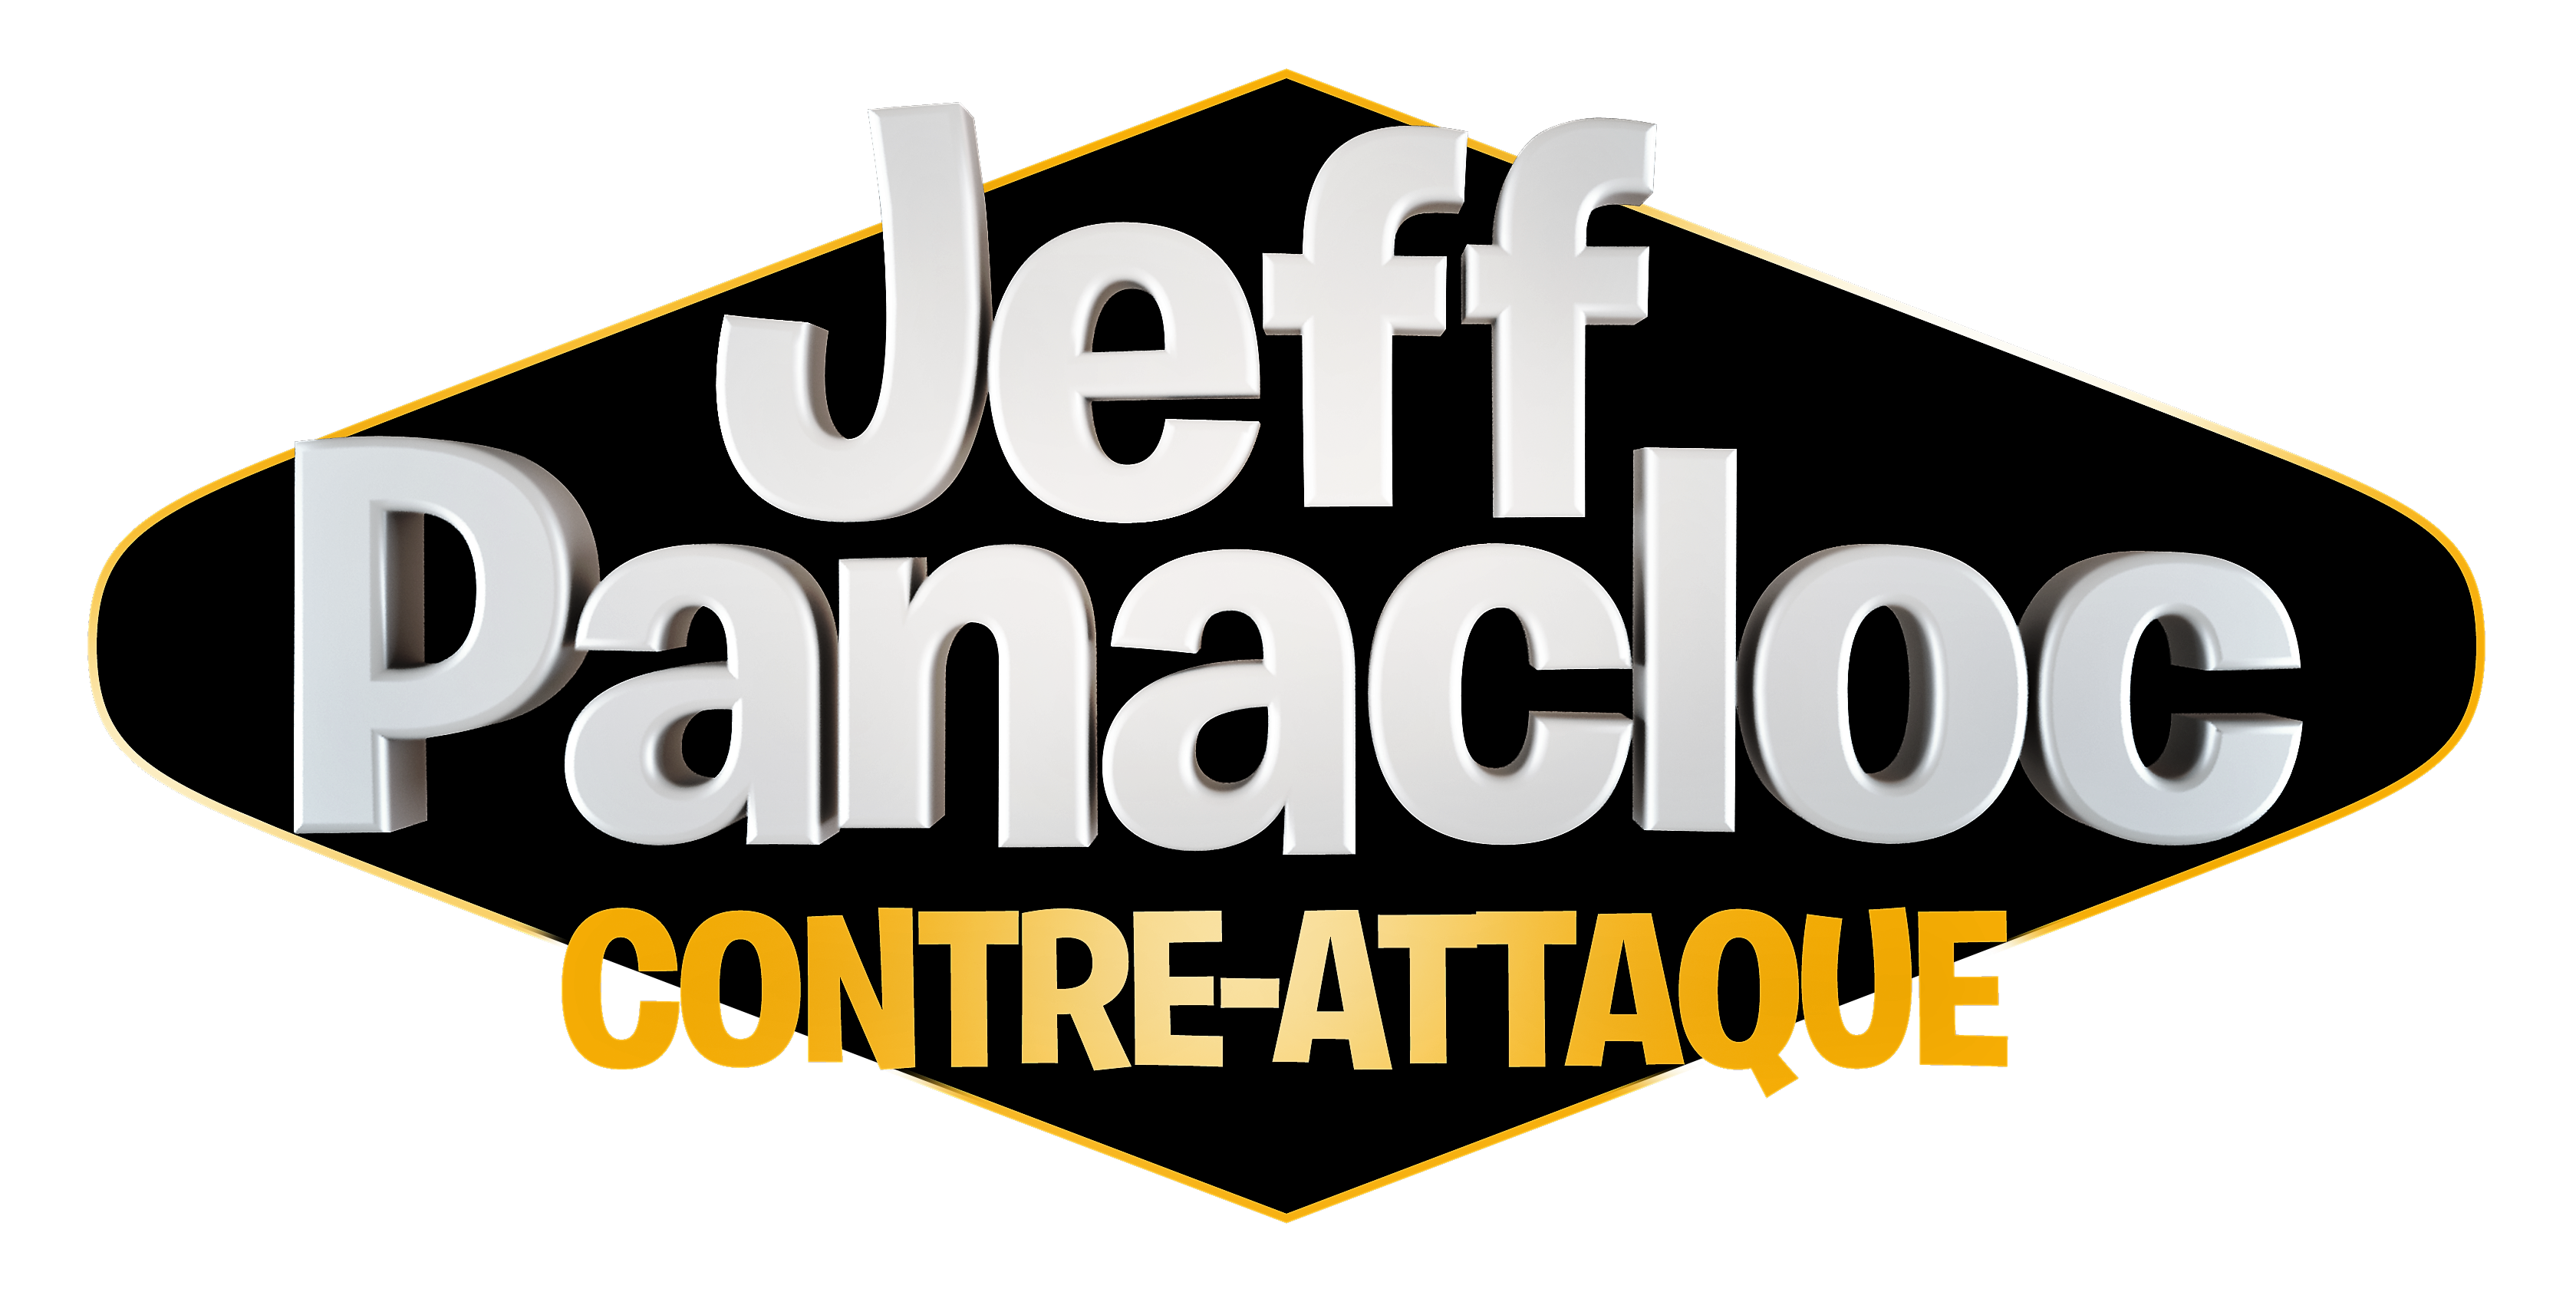 Jeff panacloc Le rýchlosť datovania